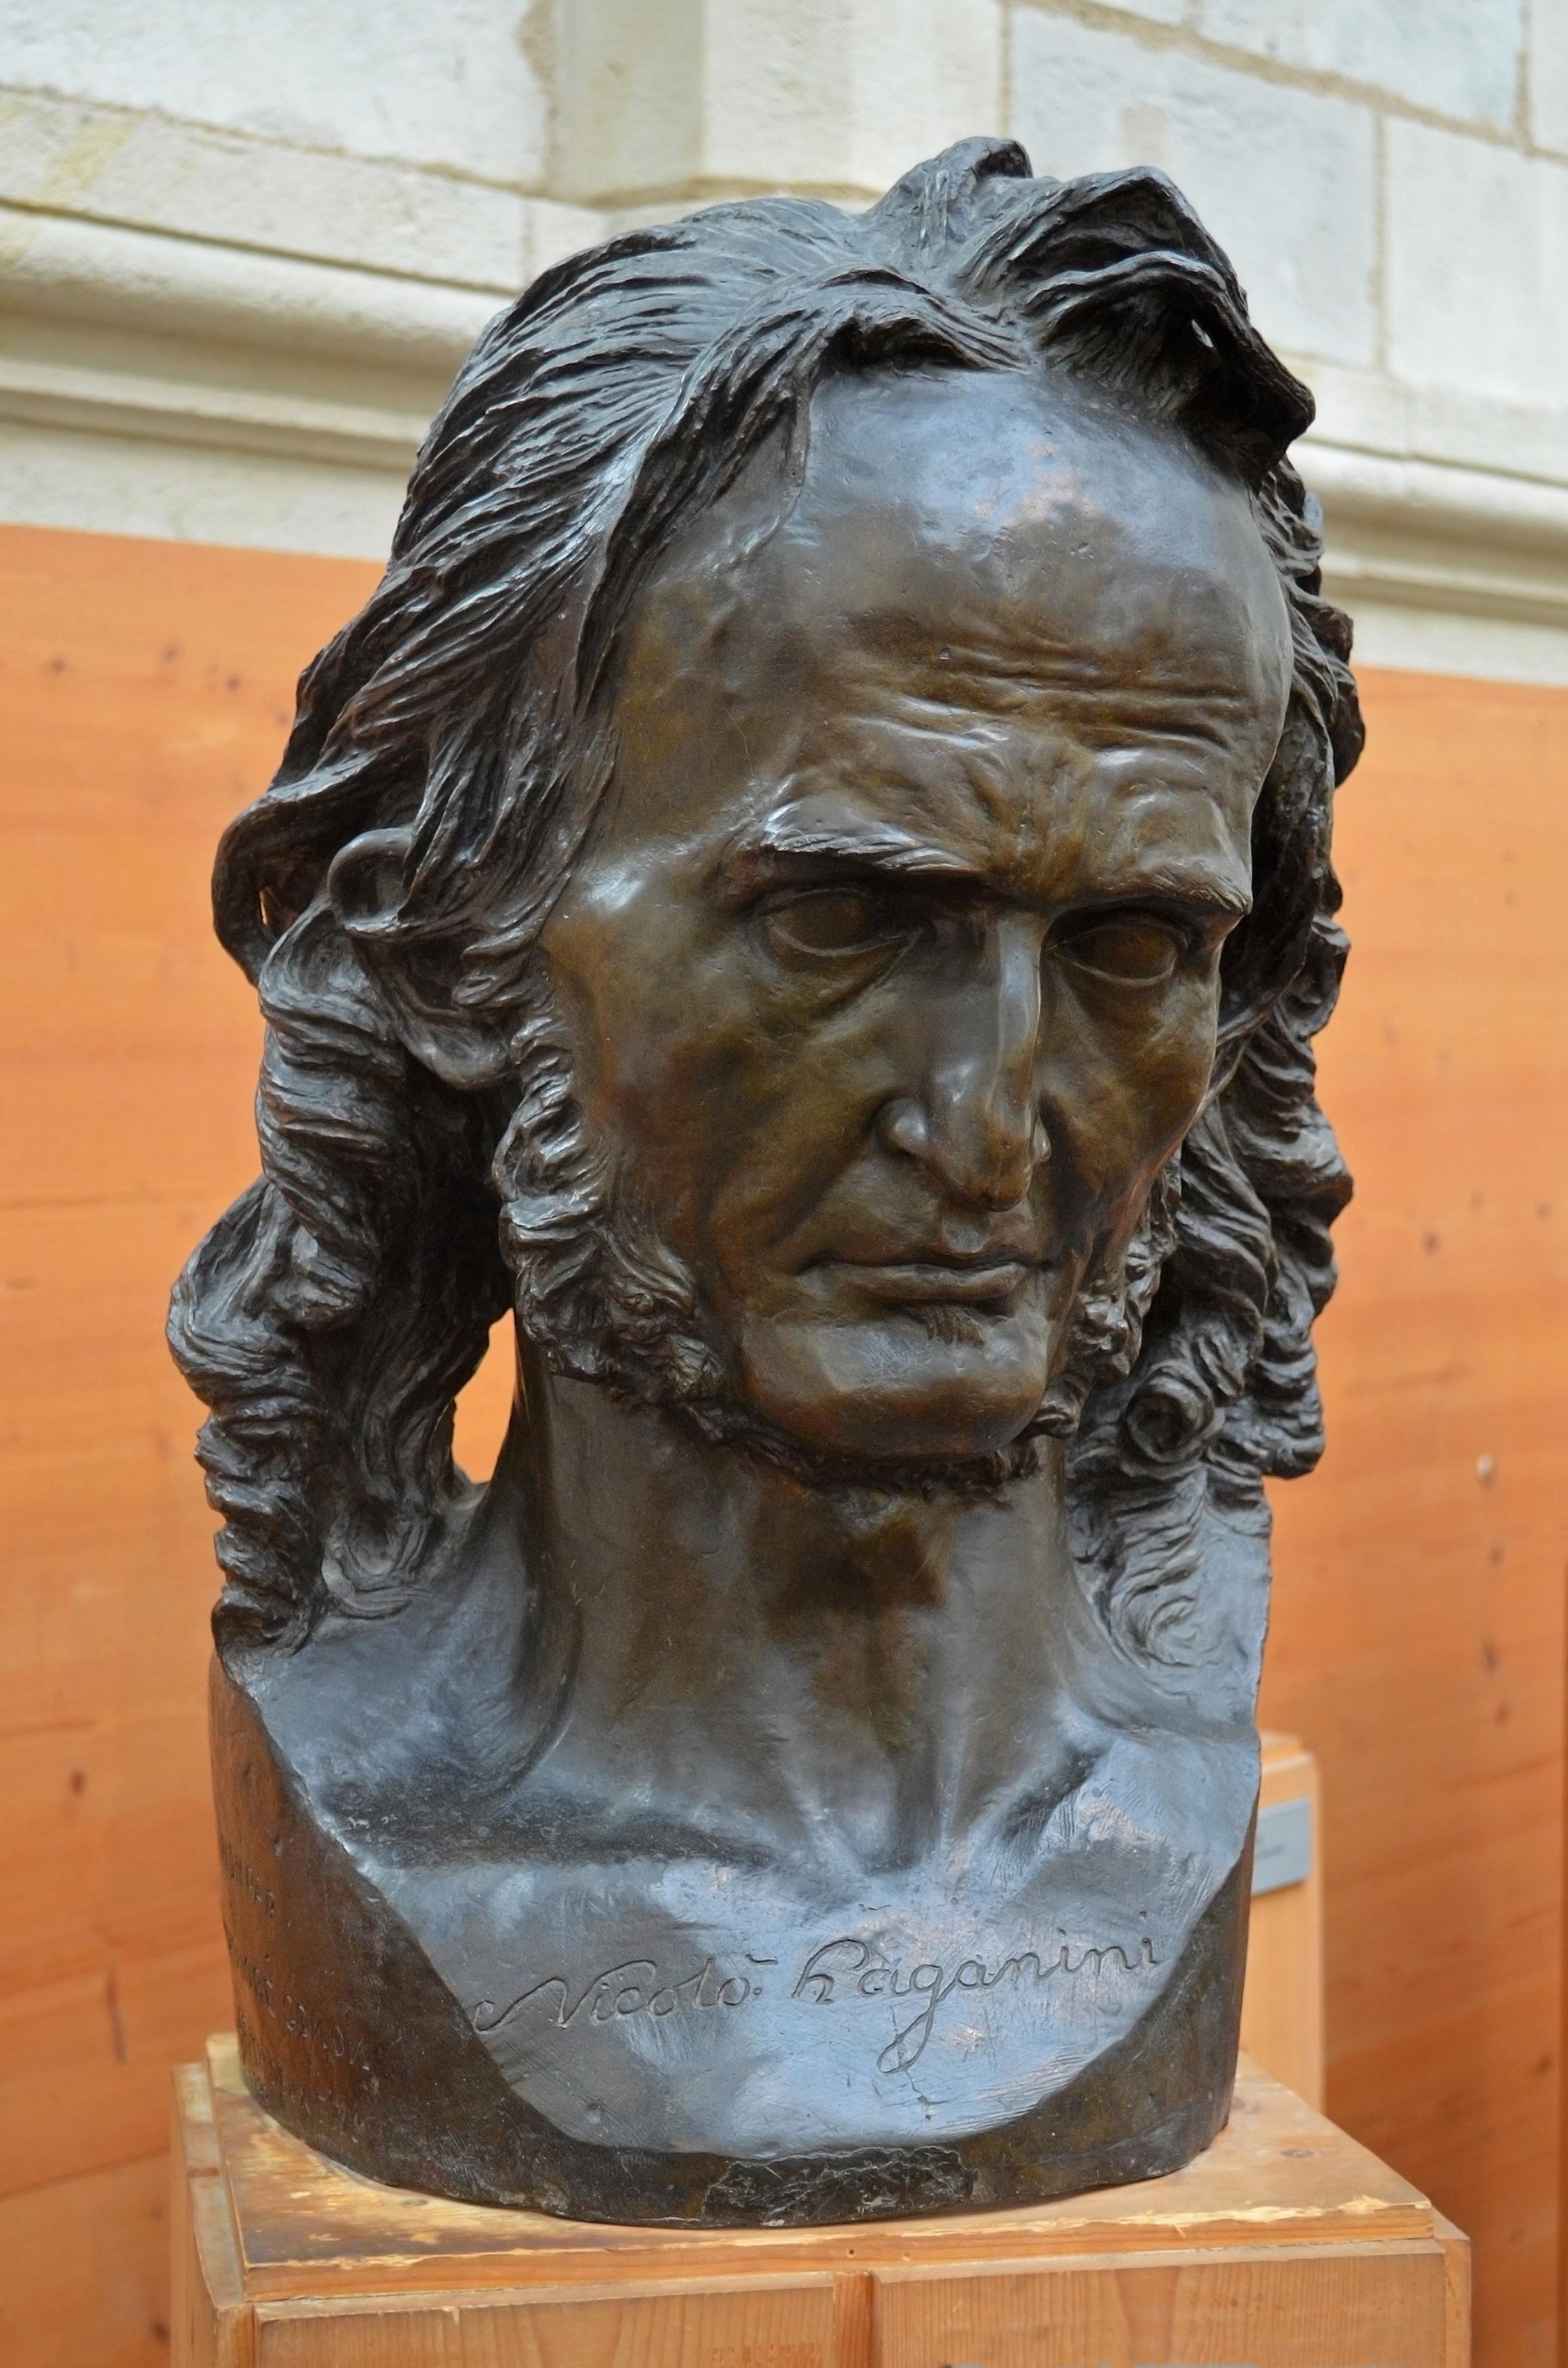 Niccolò Paganini Achille Paganini